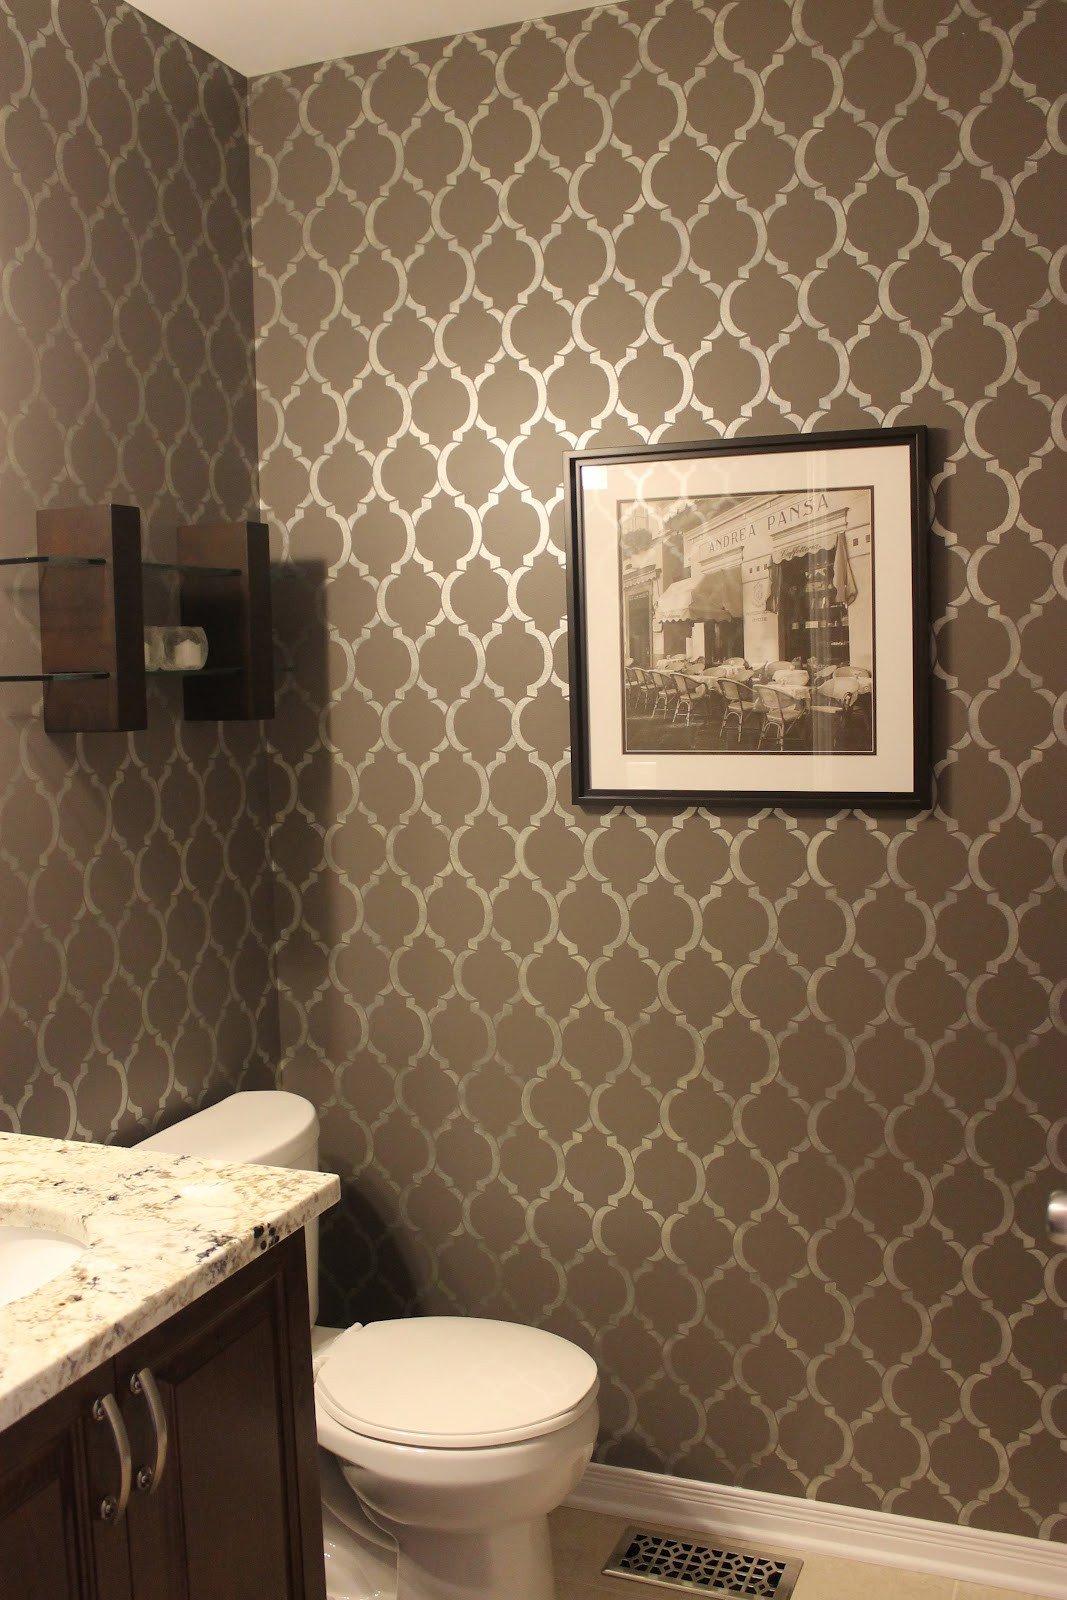 Powder Room Wall Decor Ideas Elegant Km Decor Powder Room Reveal